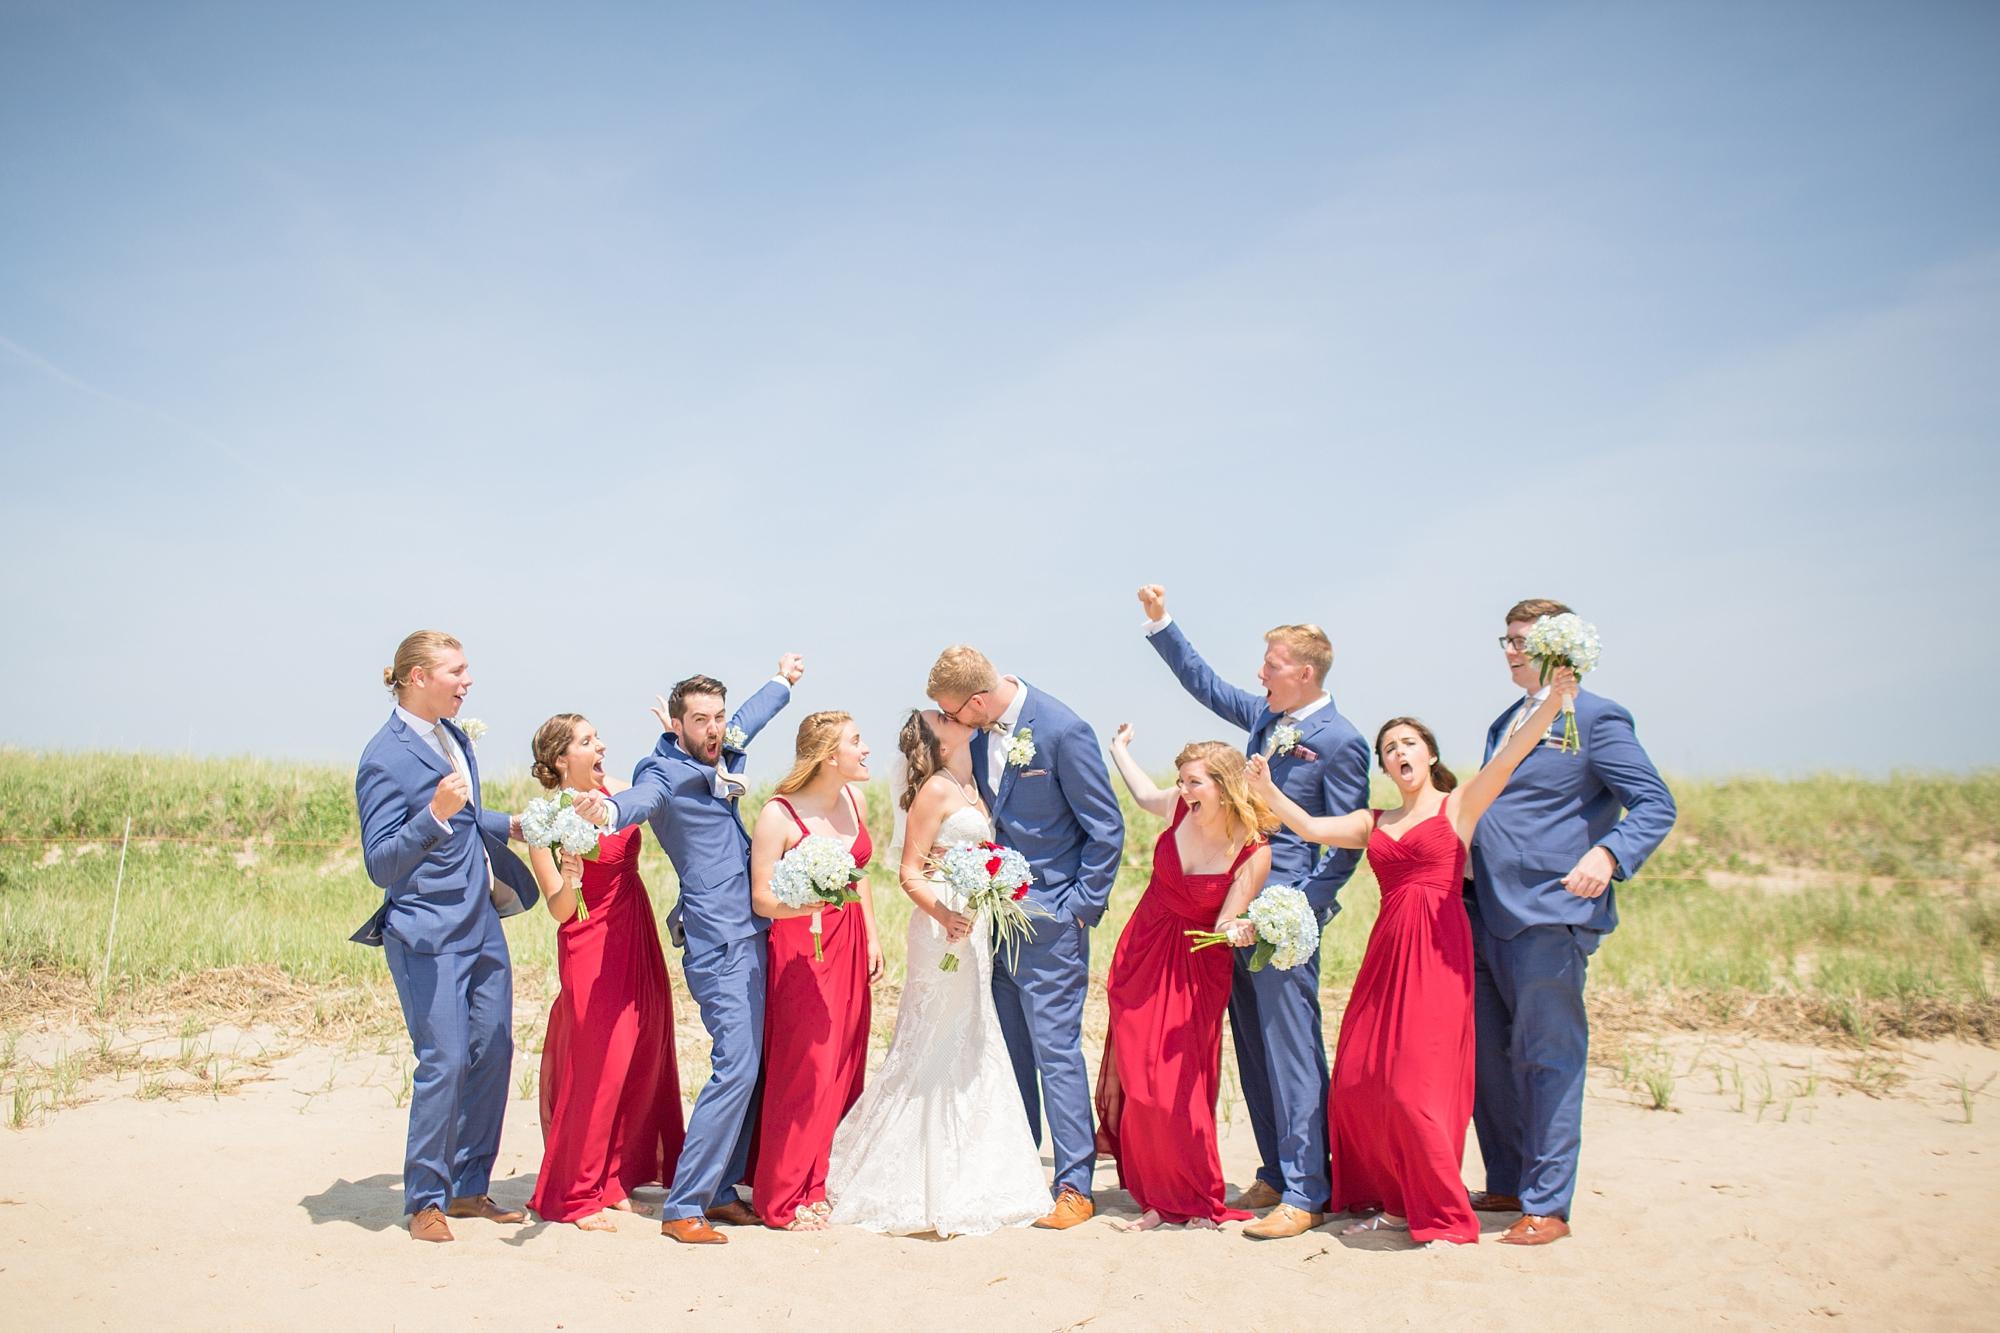 Goodman 4-Bridal Party-284_anna grace photography wellfleet cape cod massachusetts destination wedding photographer Chequessett Yacht and Country Club wedding photo.jpg